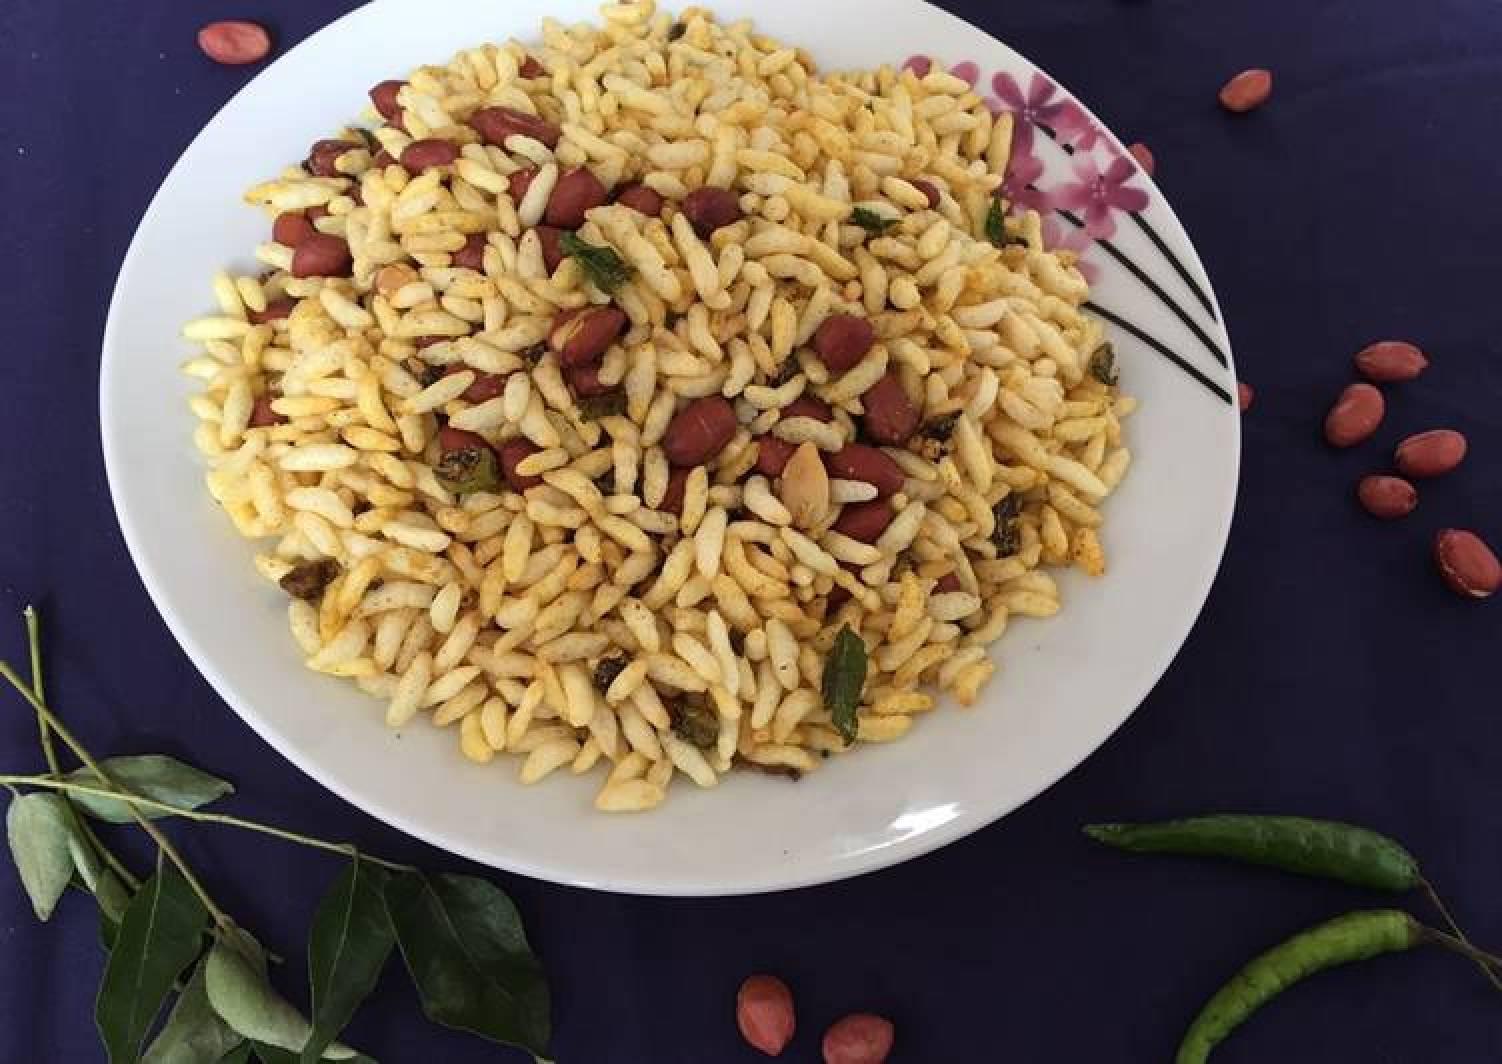 Crunchy peanut puffed rice